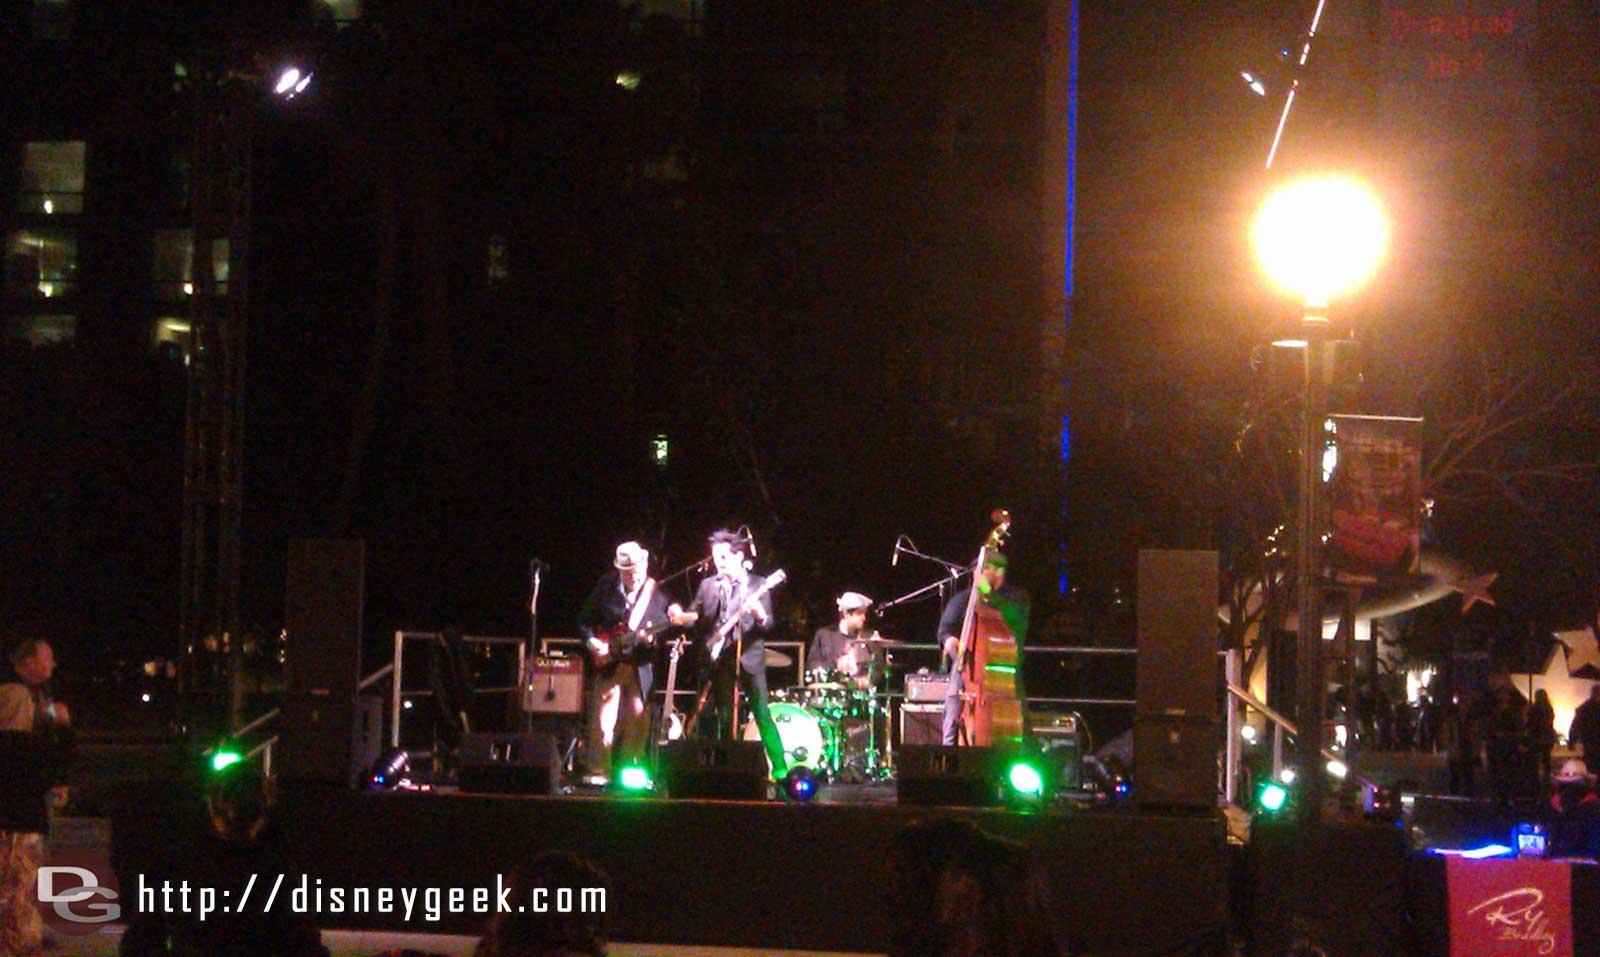 Ry Bradley performing a Hank Williams medley in Downtown Disney